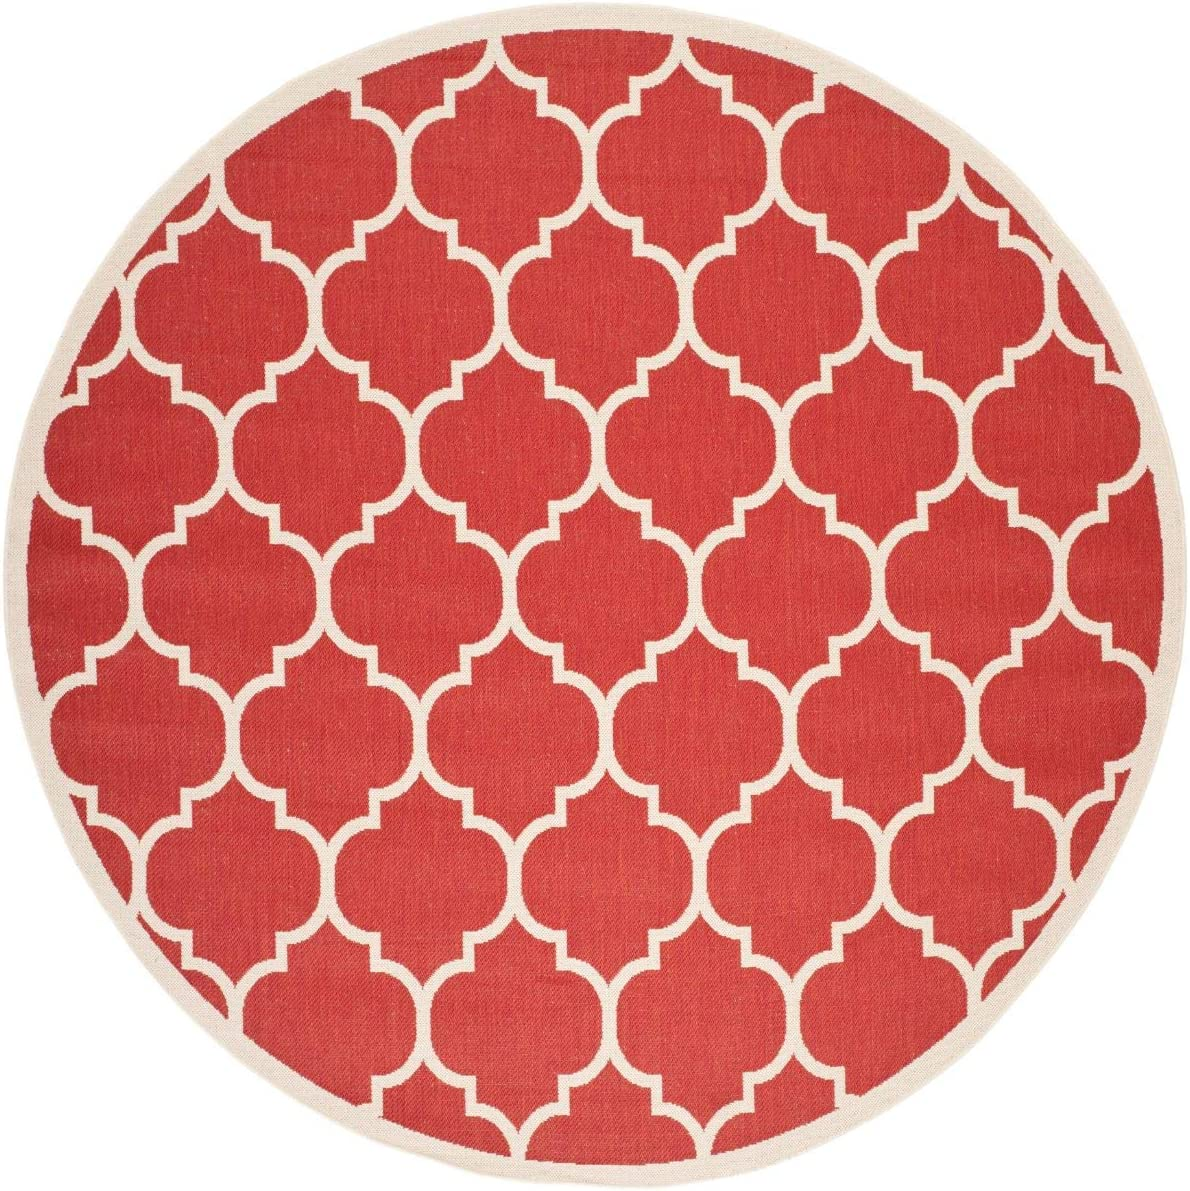 Safavieh Courtyard Collection CY6914-248 Indoor Outdoor Area Rug, 6 7 Round, Red Bone